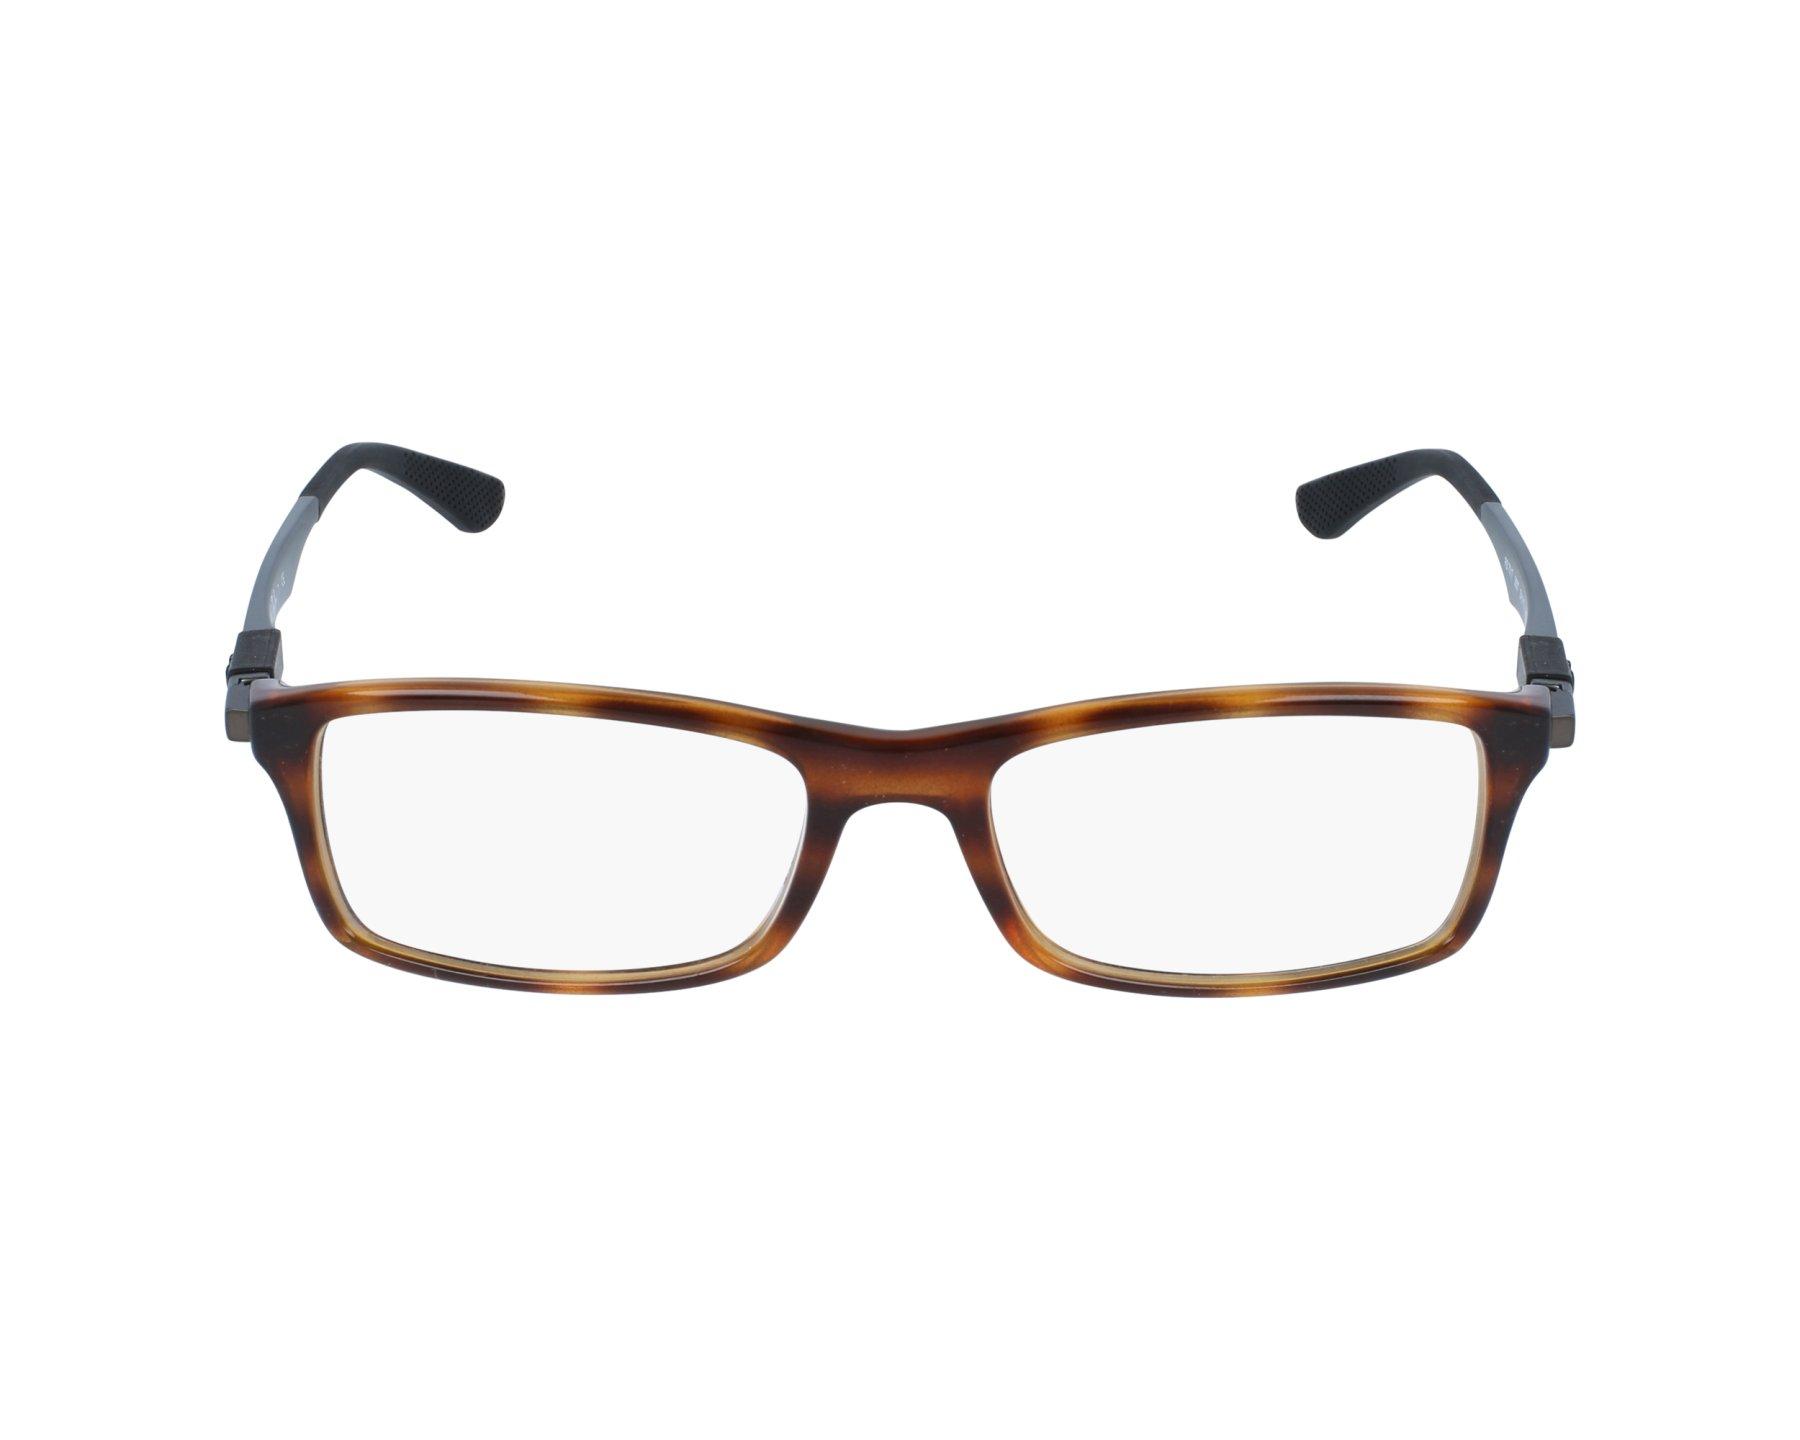 74cf40c692 eyeglasses Ray-Ban RX-7017 5687 54-17 Havana Blue profile view